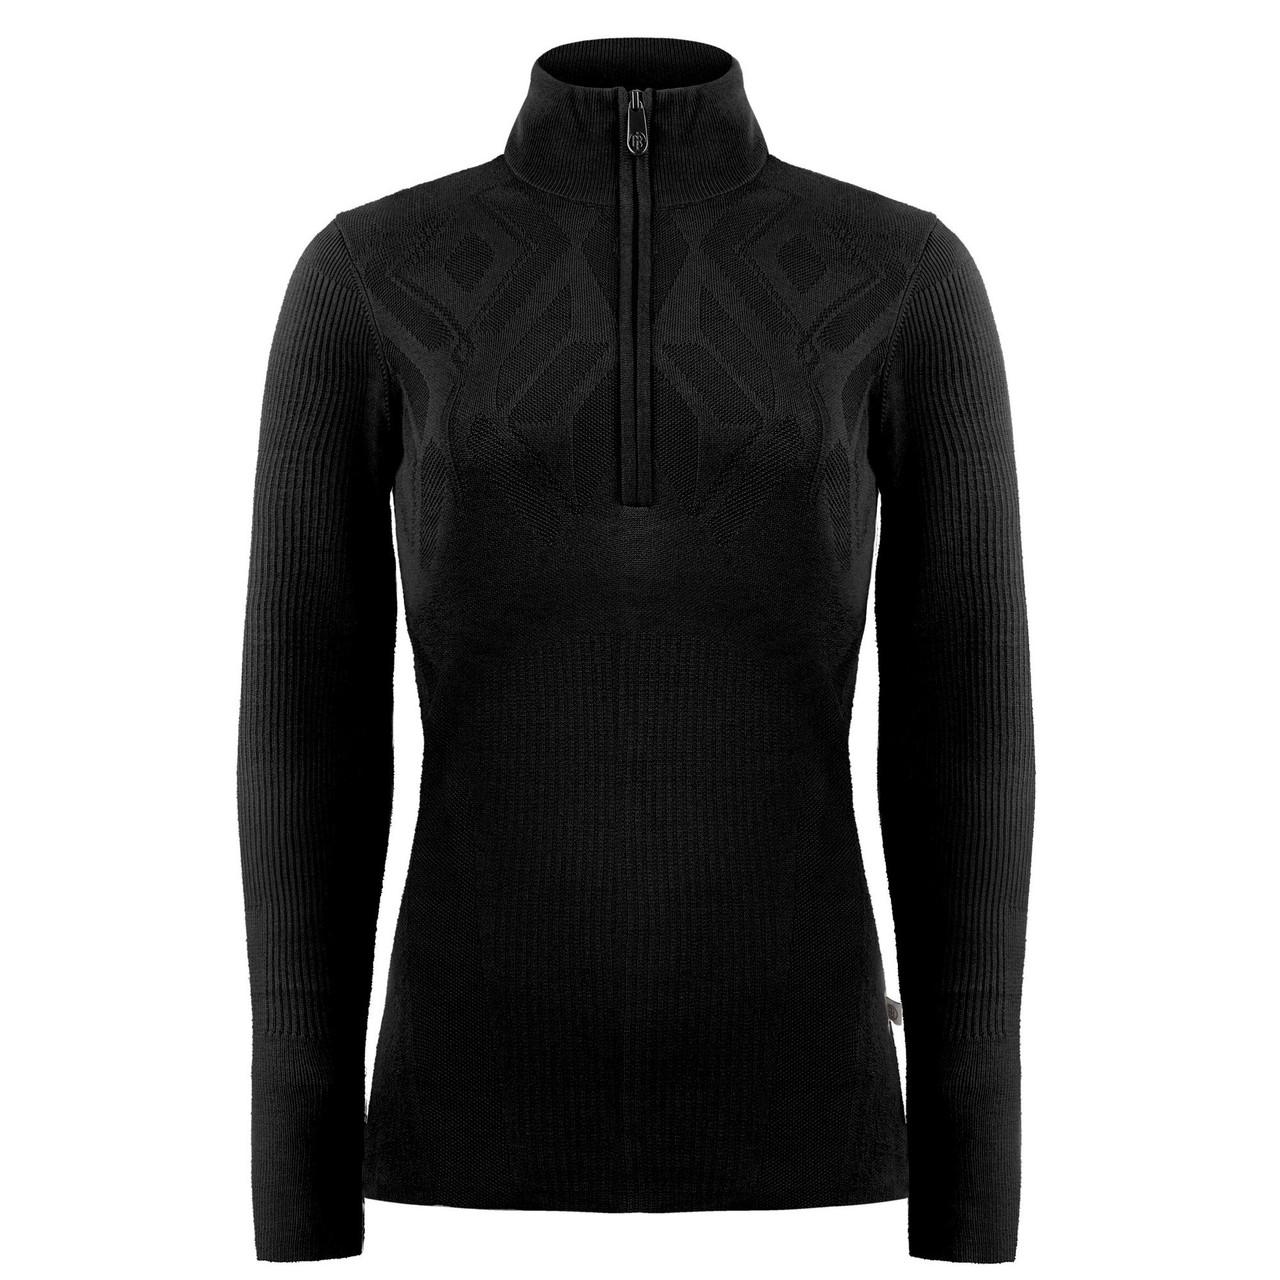 Горнолыжный свитер Poivre Blanc WO Knit sweater black  р. L